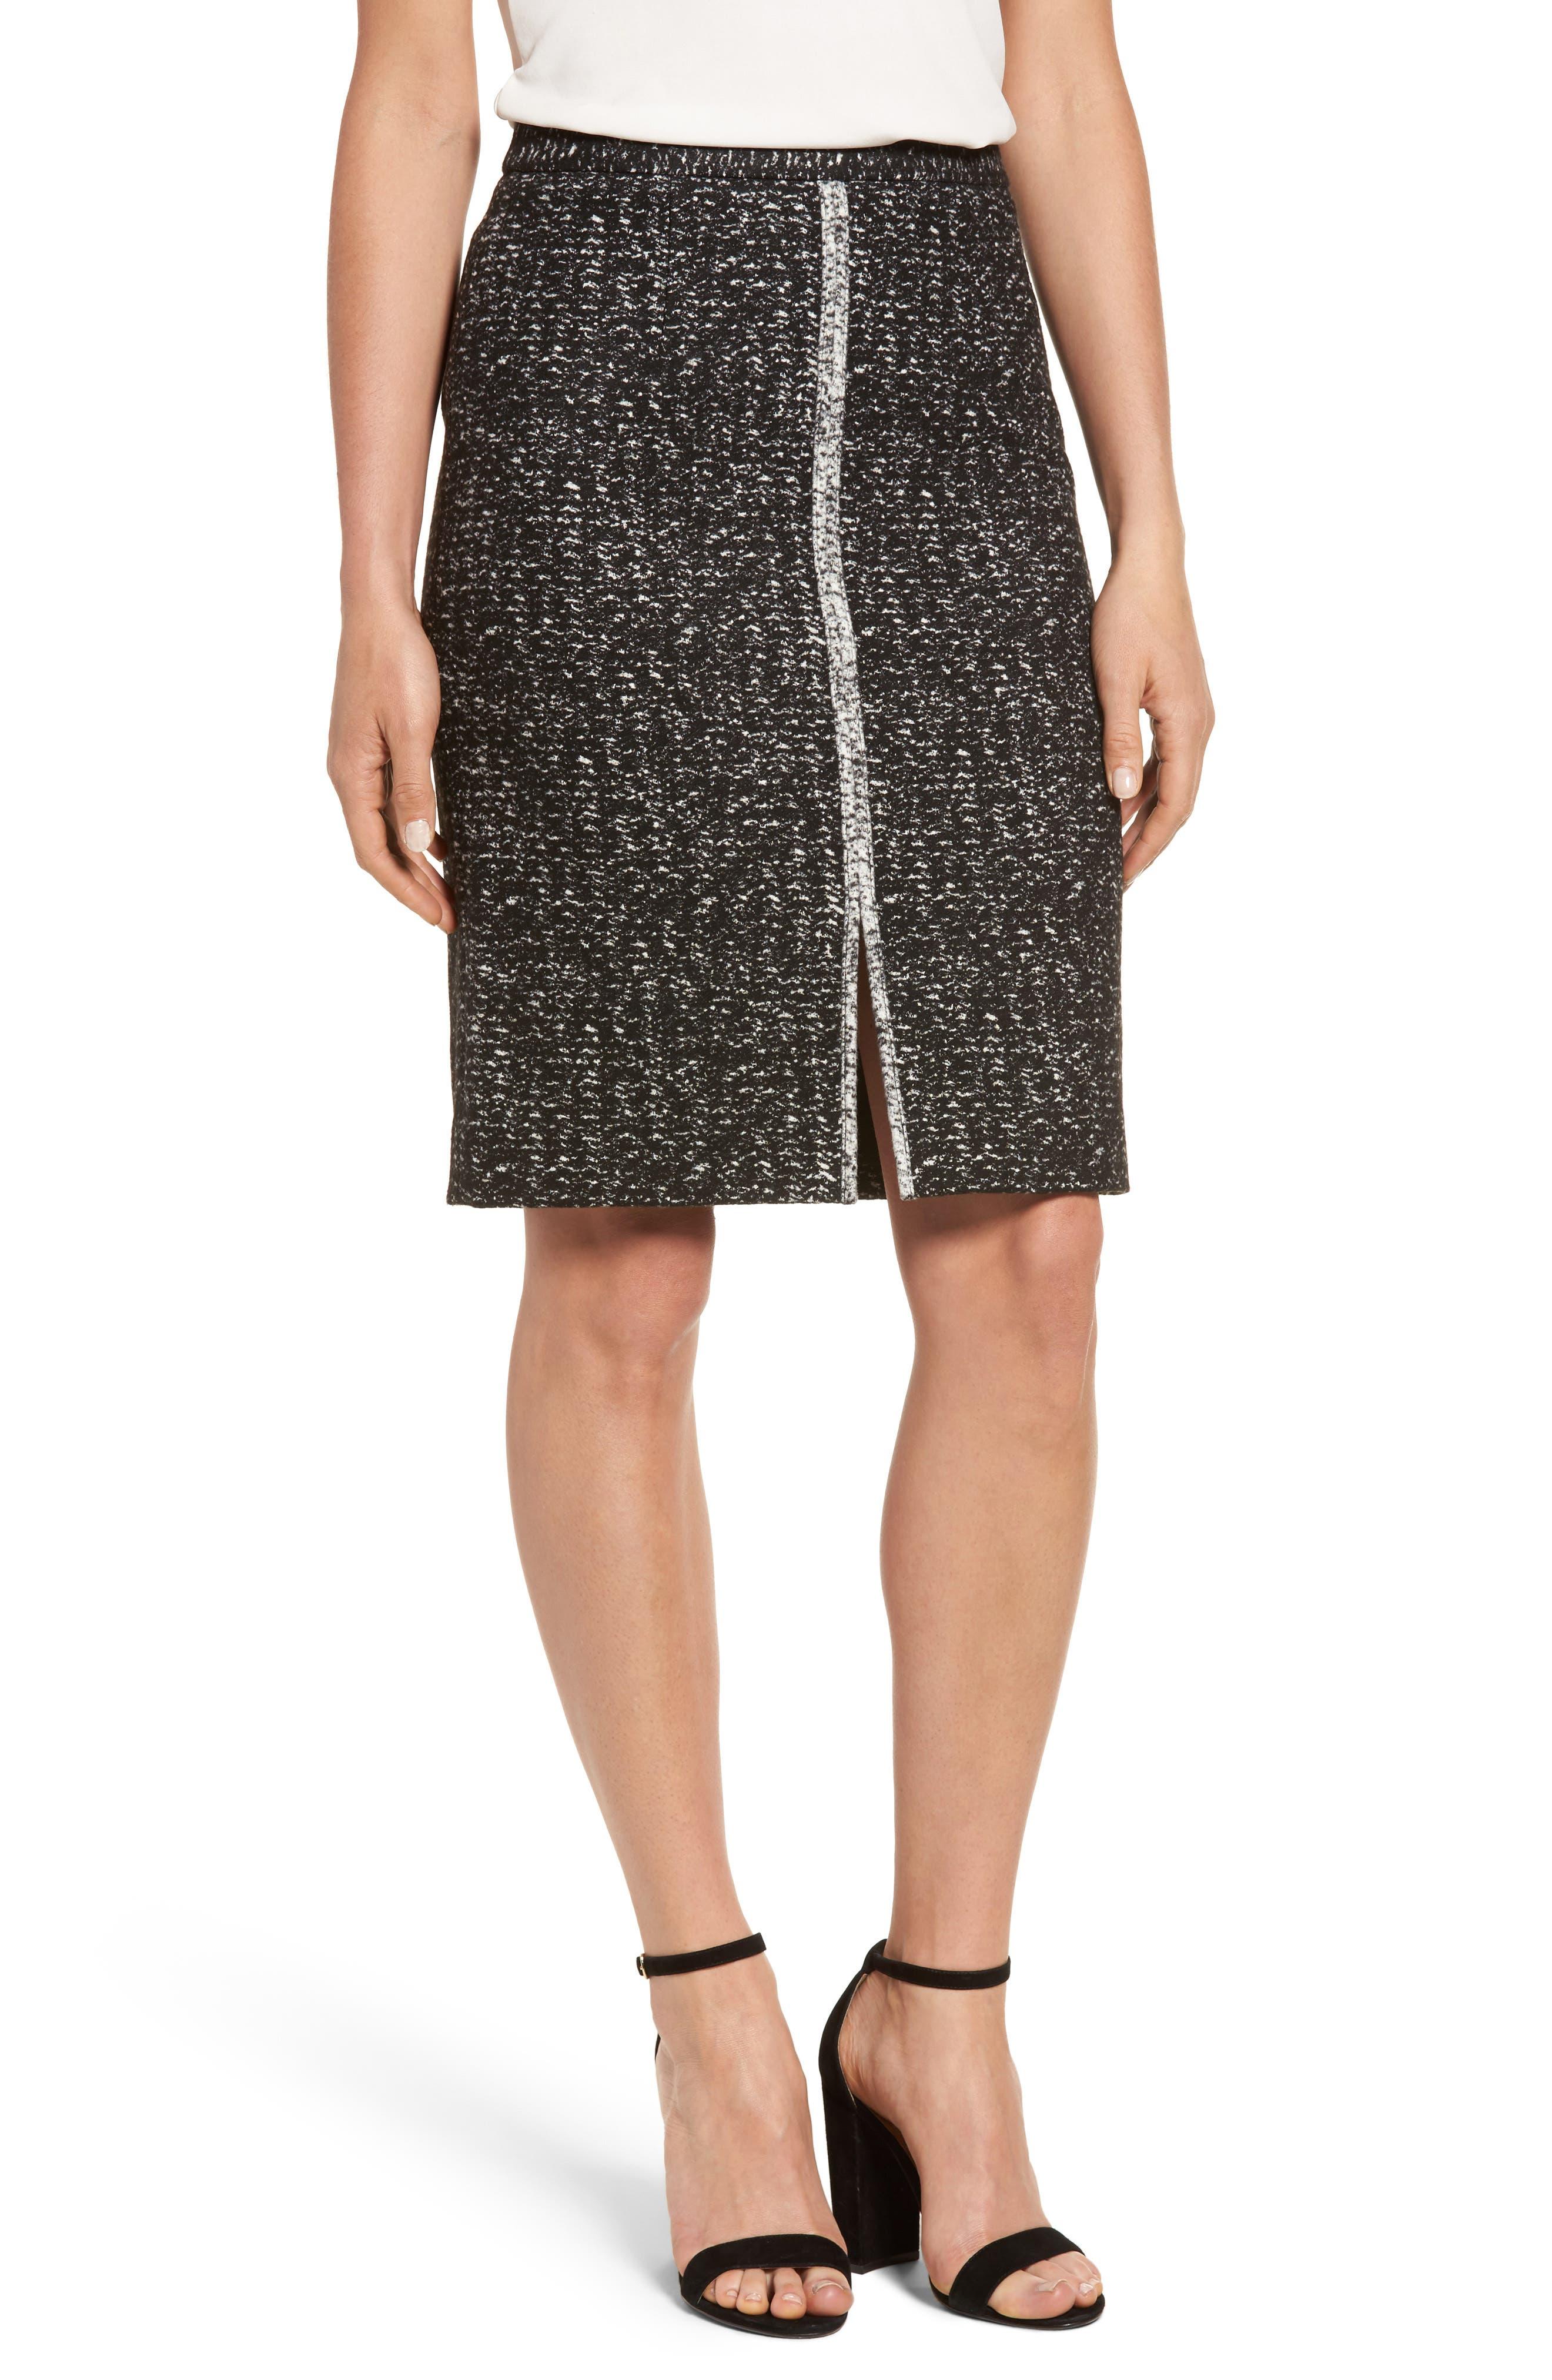 Emerson Rose Contrast Trim Skirt